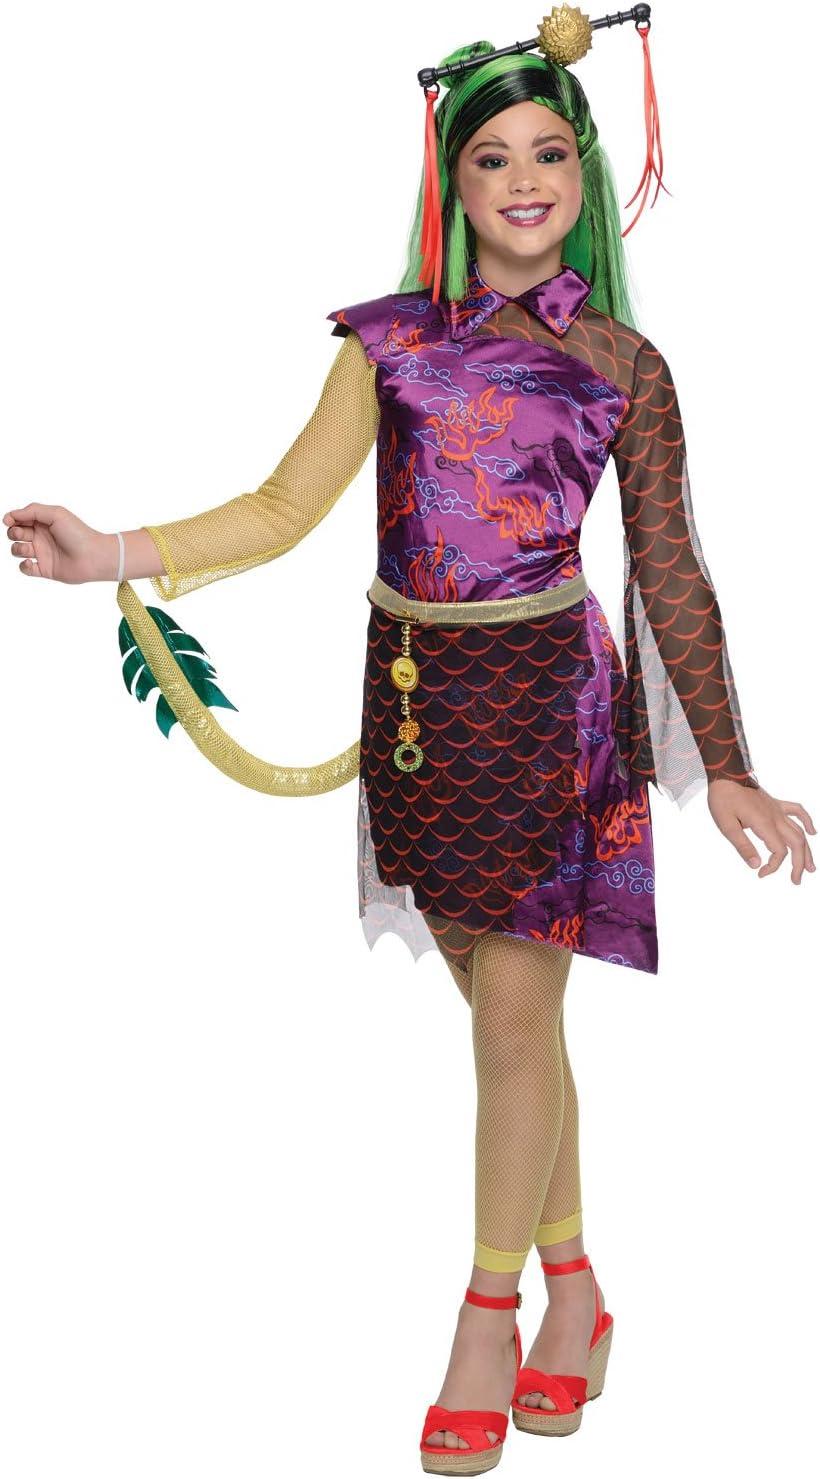 Monster High Lagoona Blue Kostuem.Rubies Monster High Jinafire Long Costume Medium Amazon Ca Toys Games